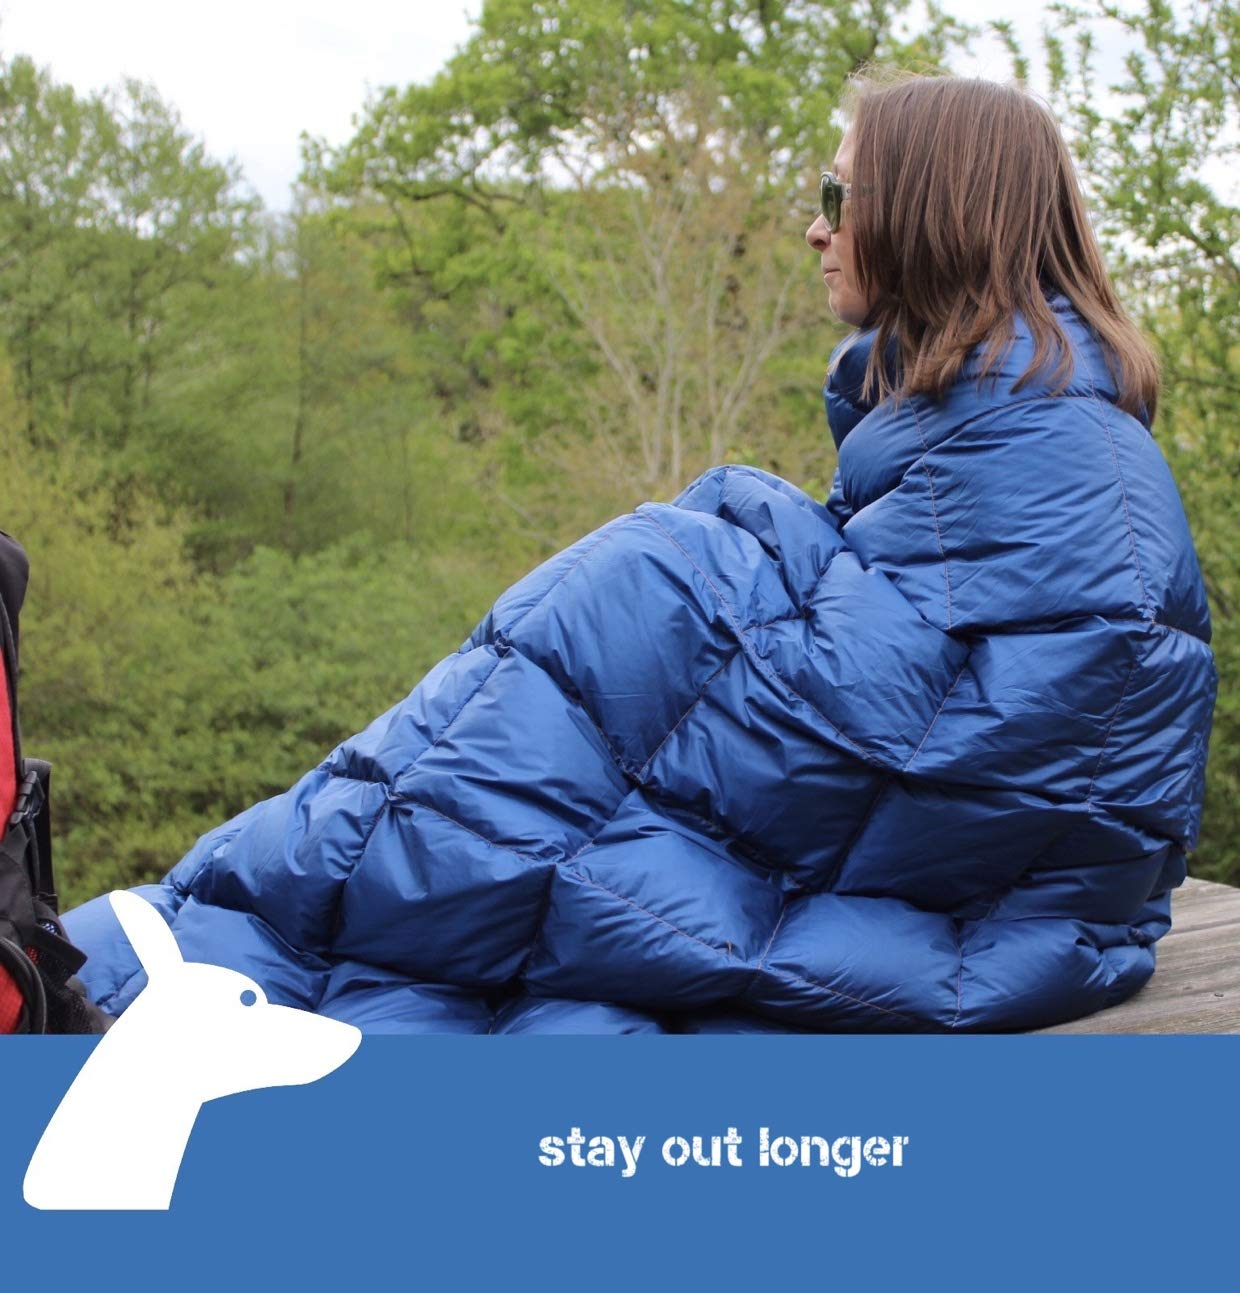 Amazon.com: Horizon - Manta de acampada para acampada ...